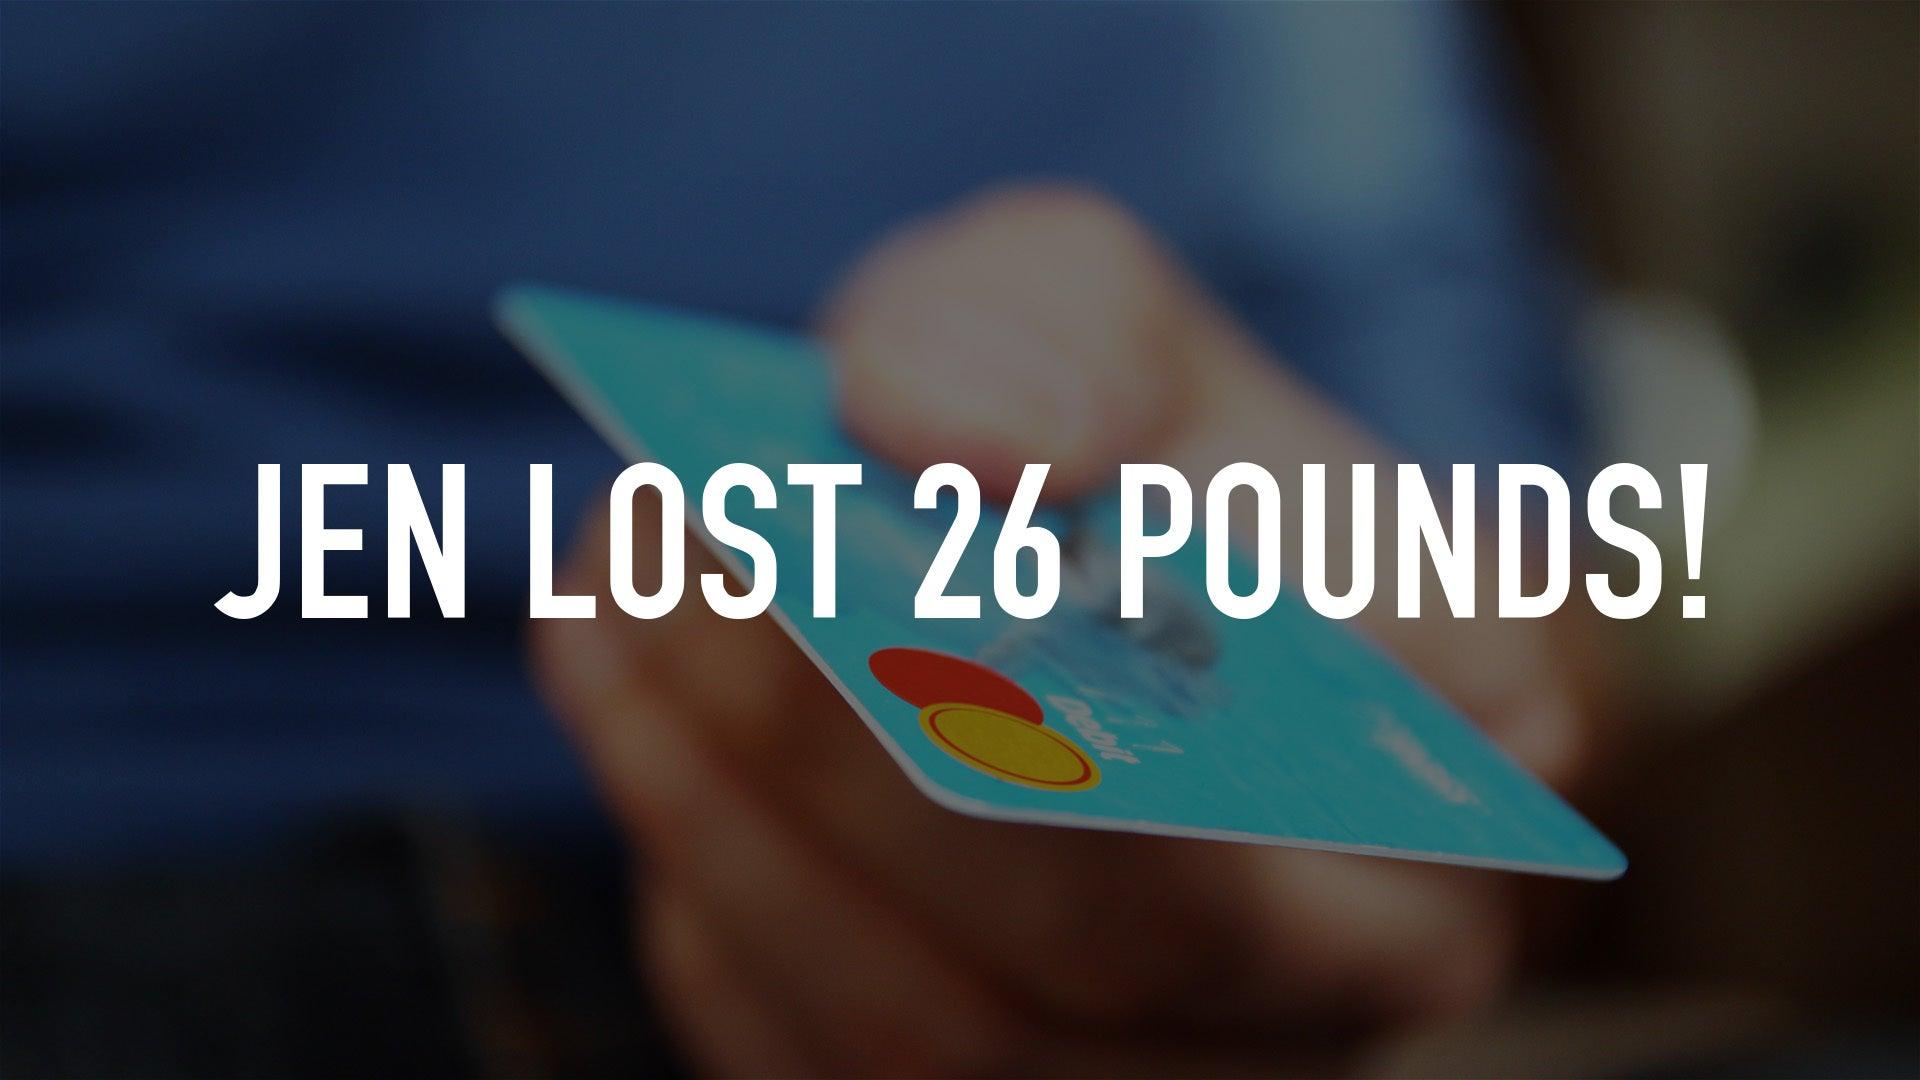 Jen Lost 26 Pounds!